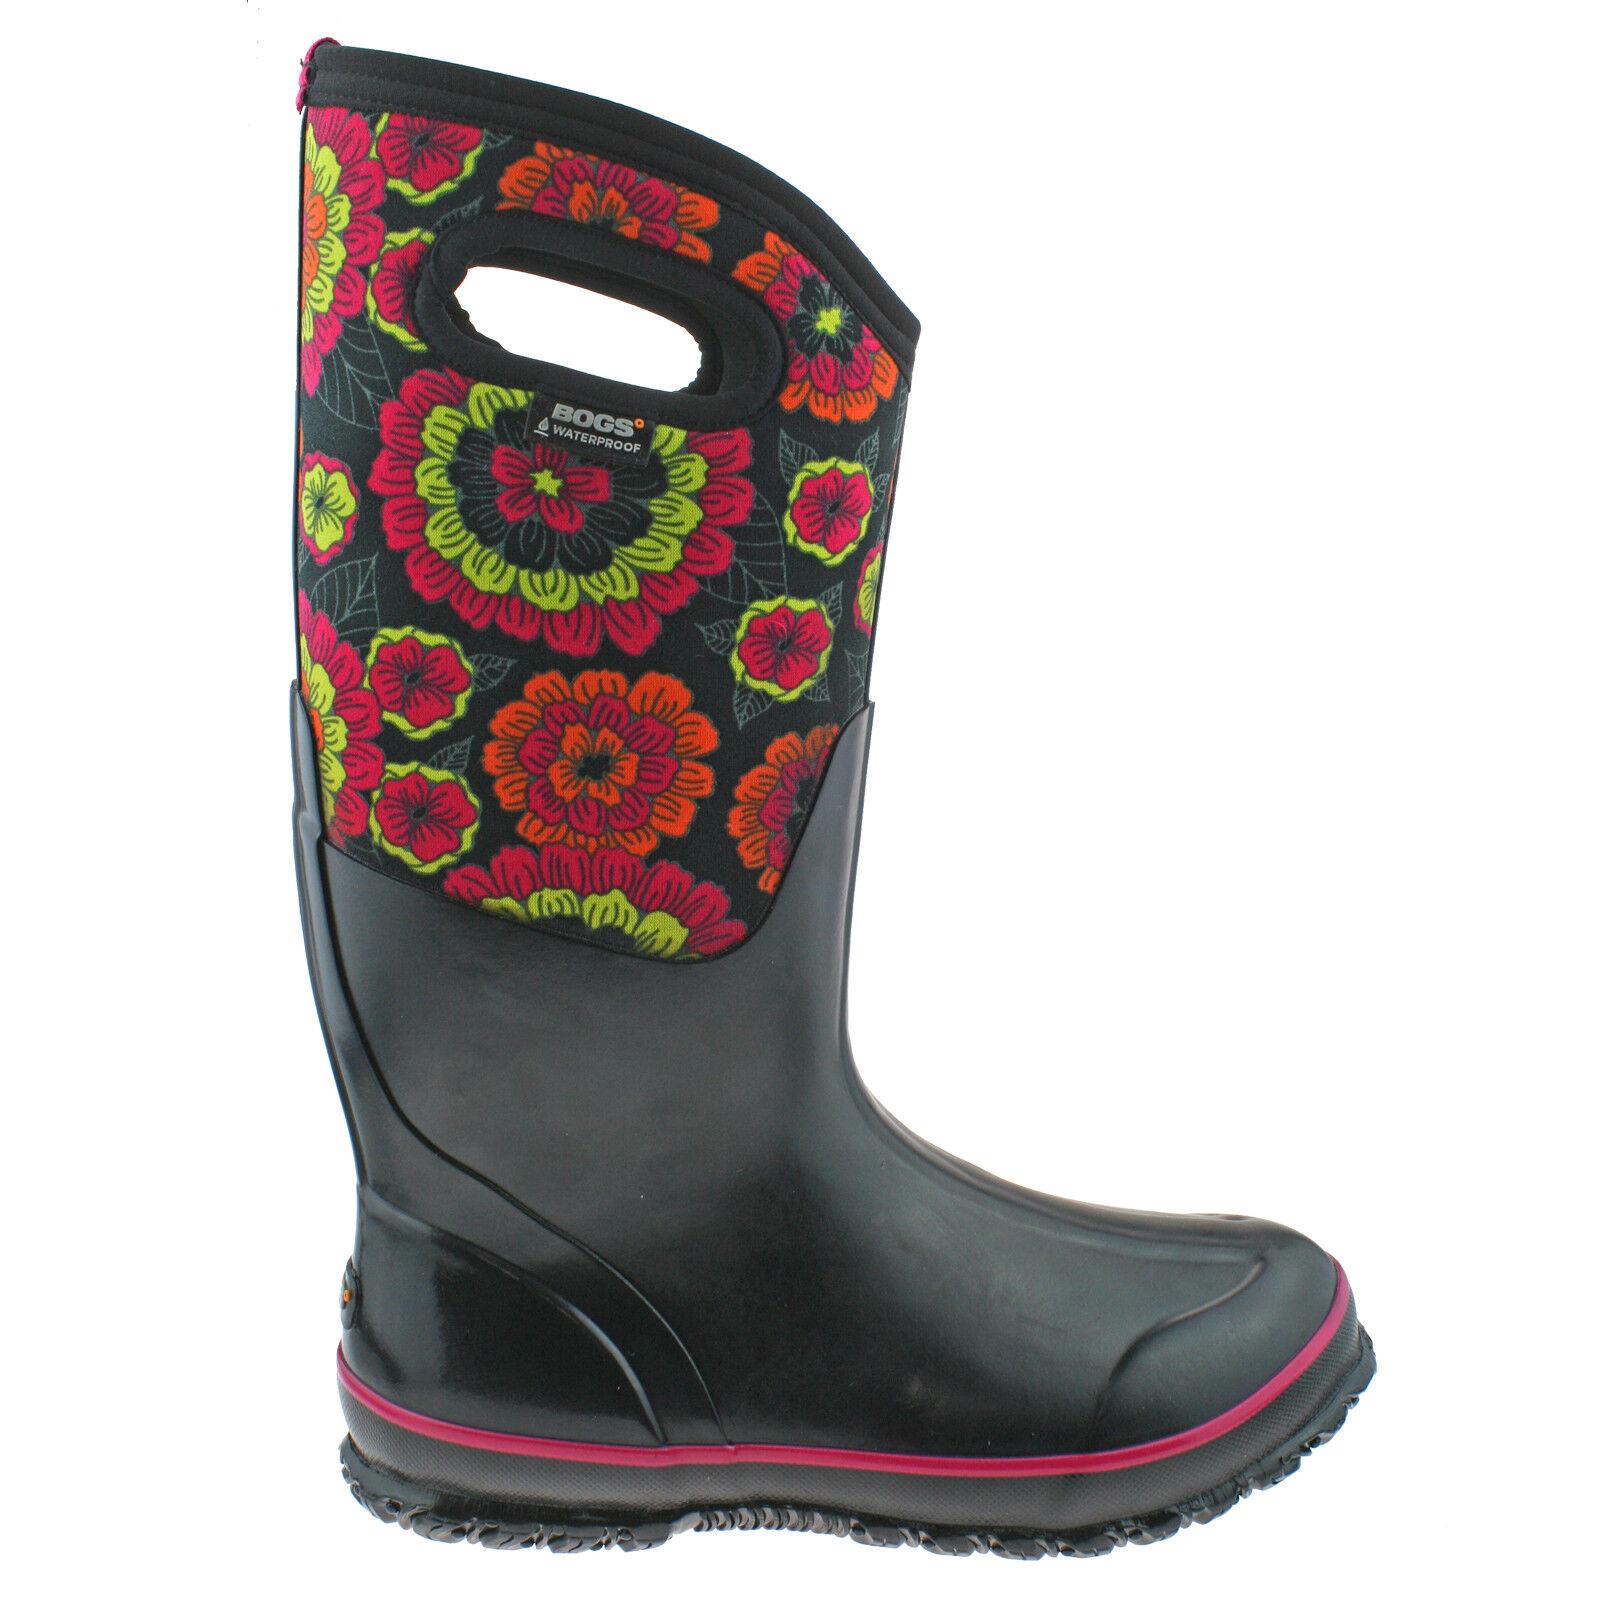 LADIES BOGS CLASSIC PANSIES schwarz INSULATED WARM WATERPROOF WELLIES Stiefel 72117